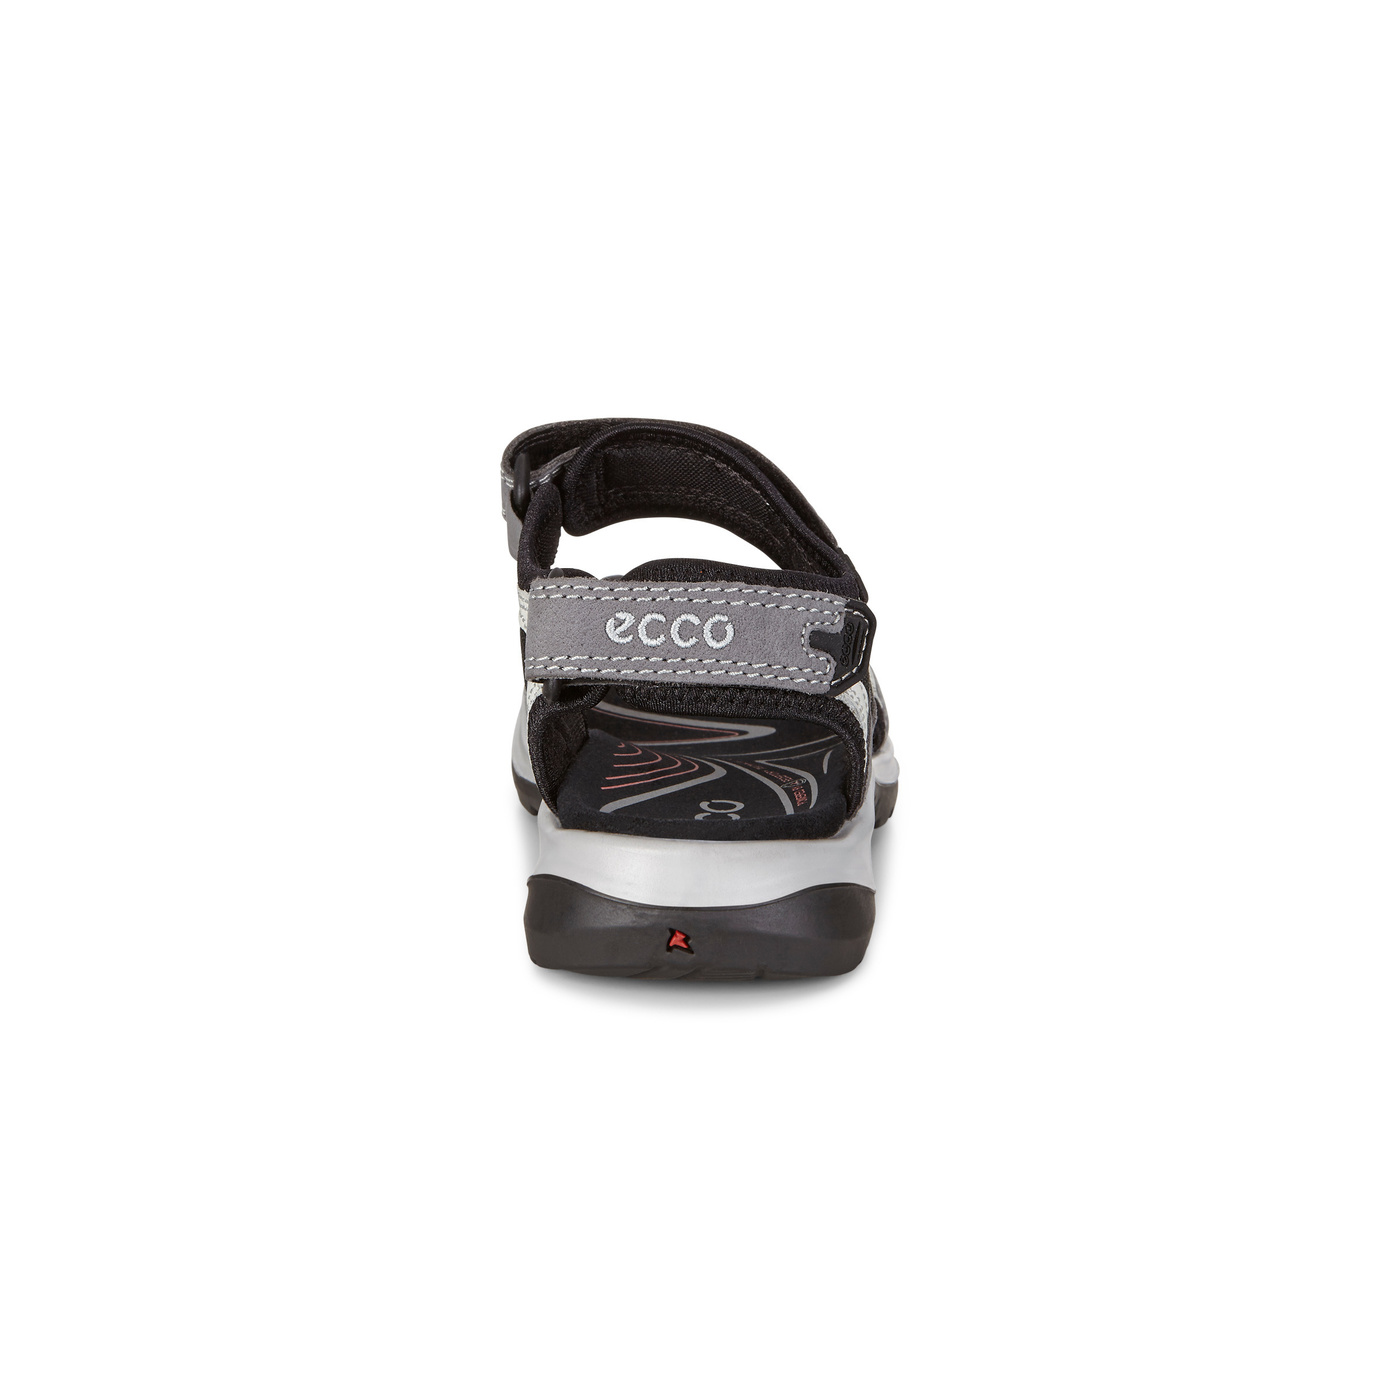 Ecco Offroad Titanium Yucatan 069563 02244